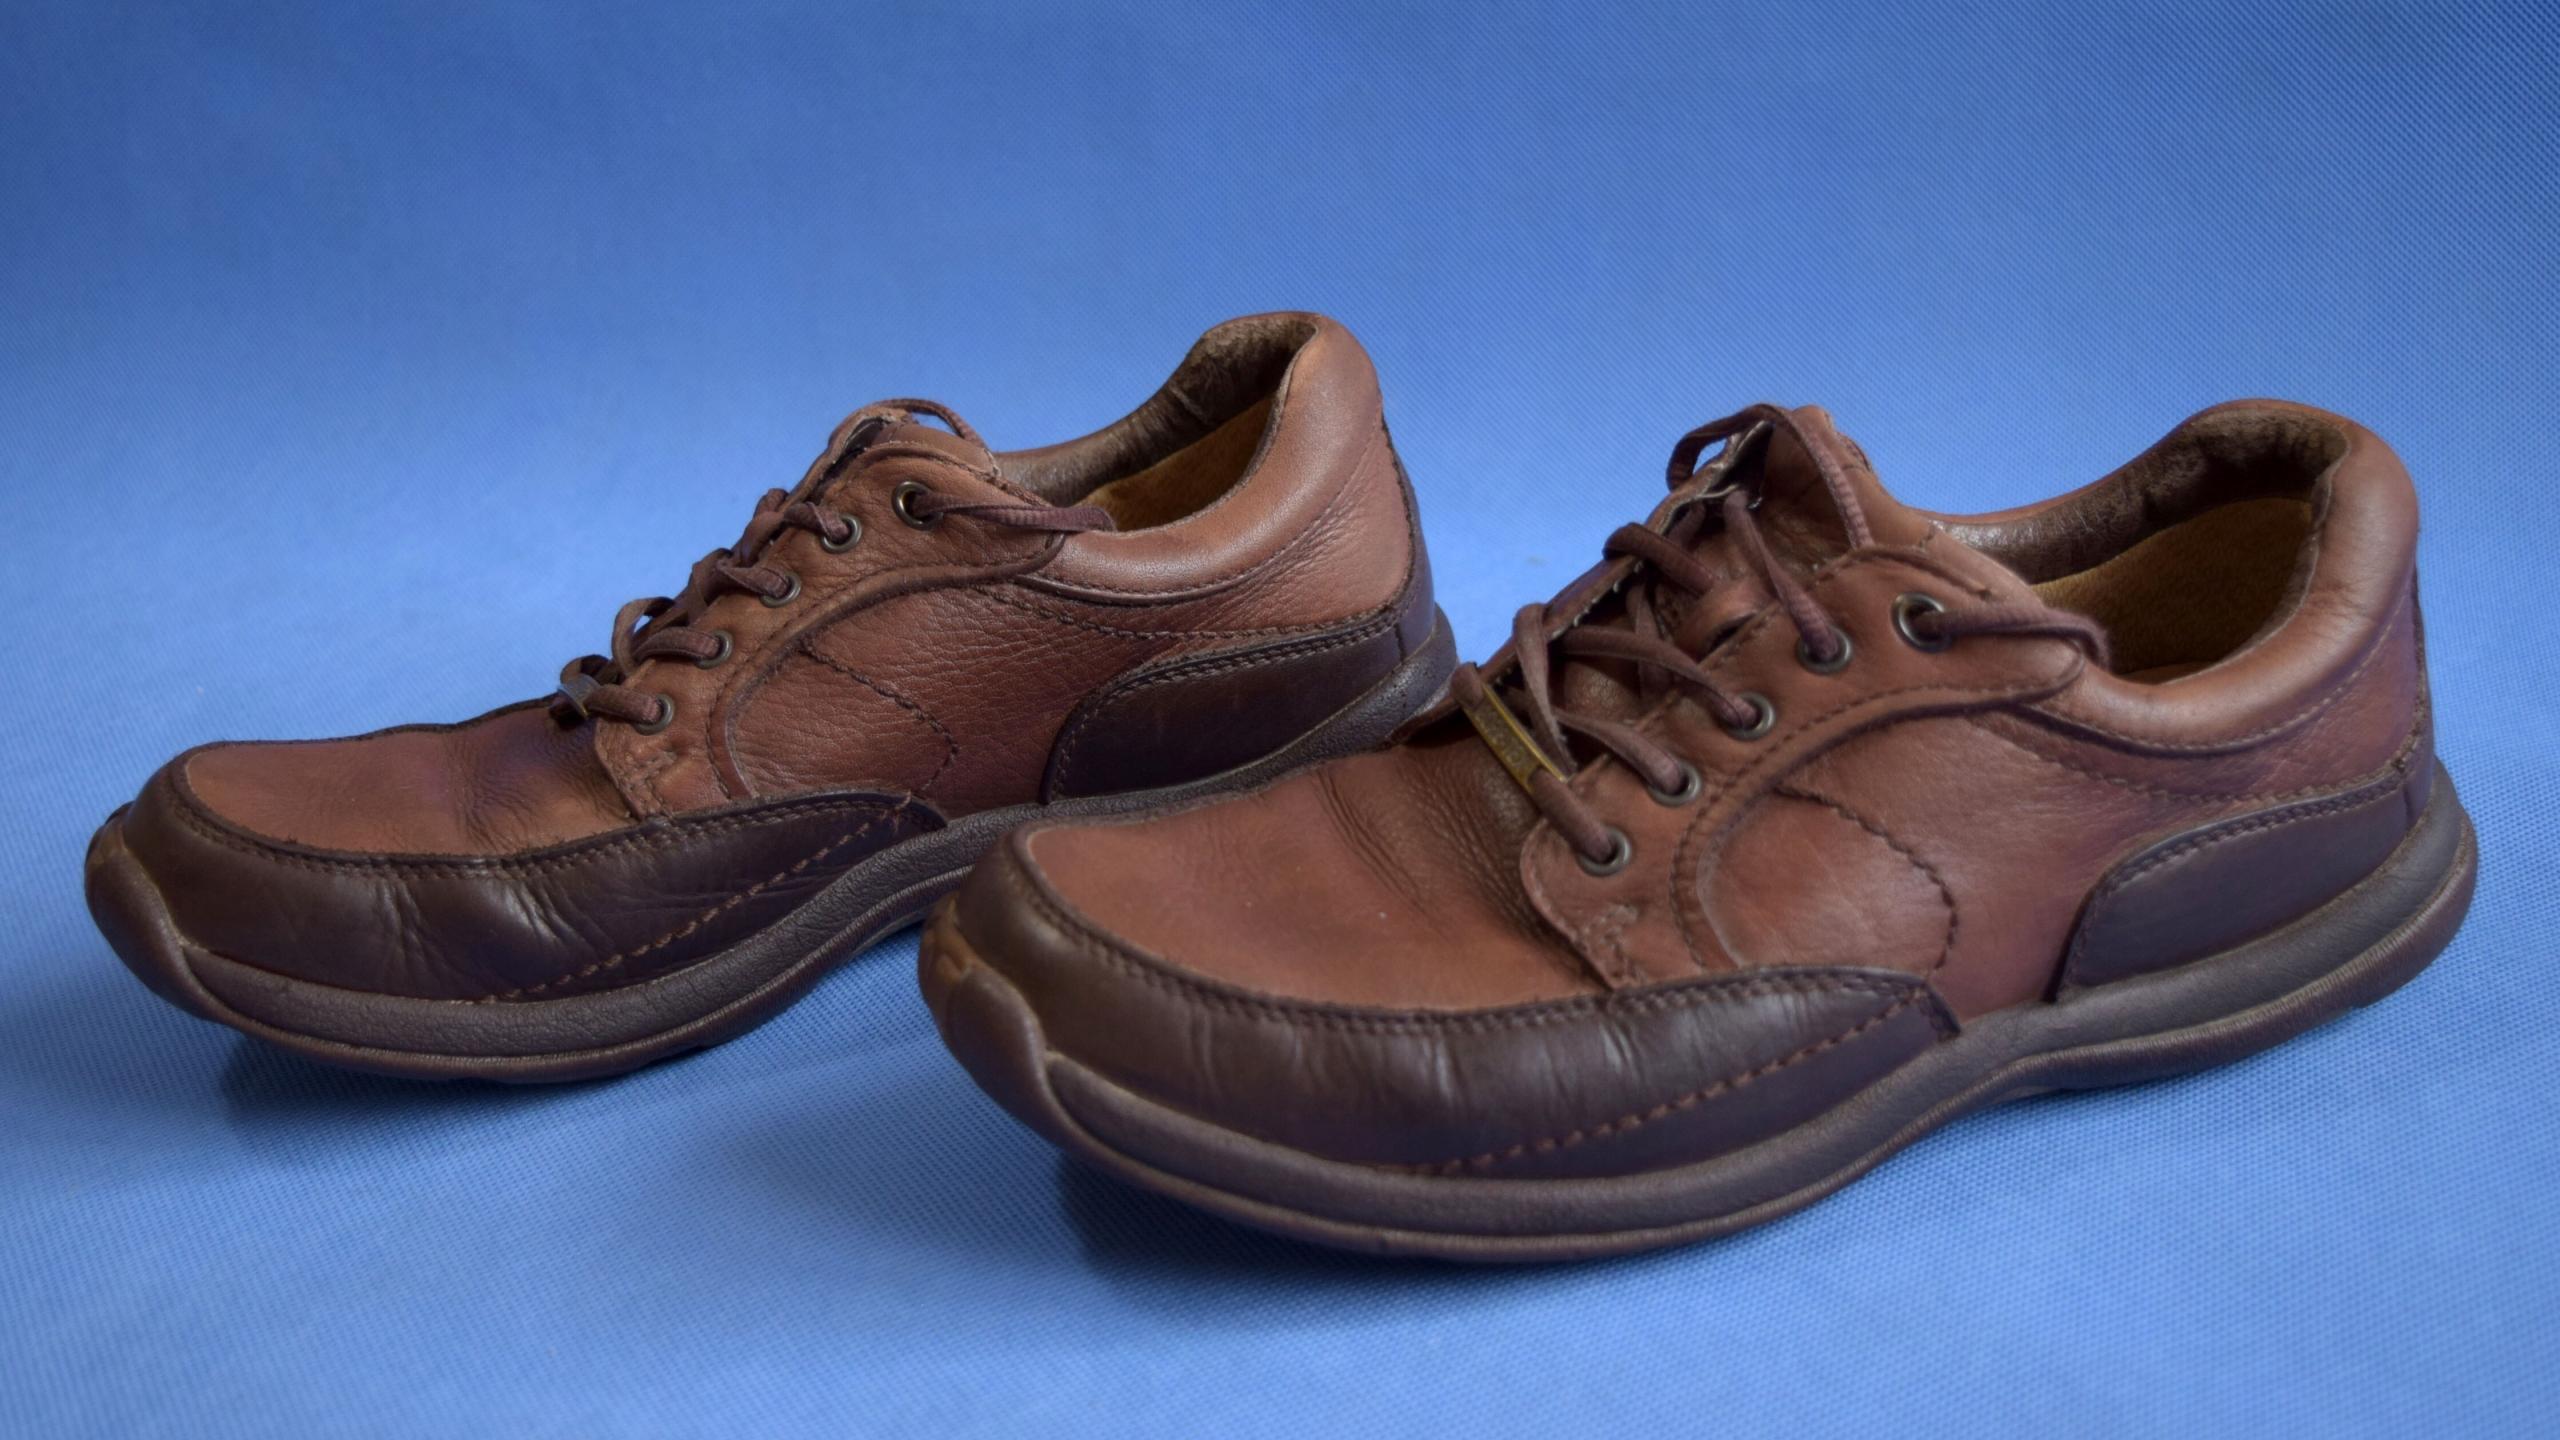 Clarks gore-tex buty skóra męskie 41,5